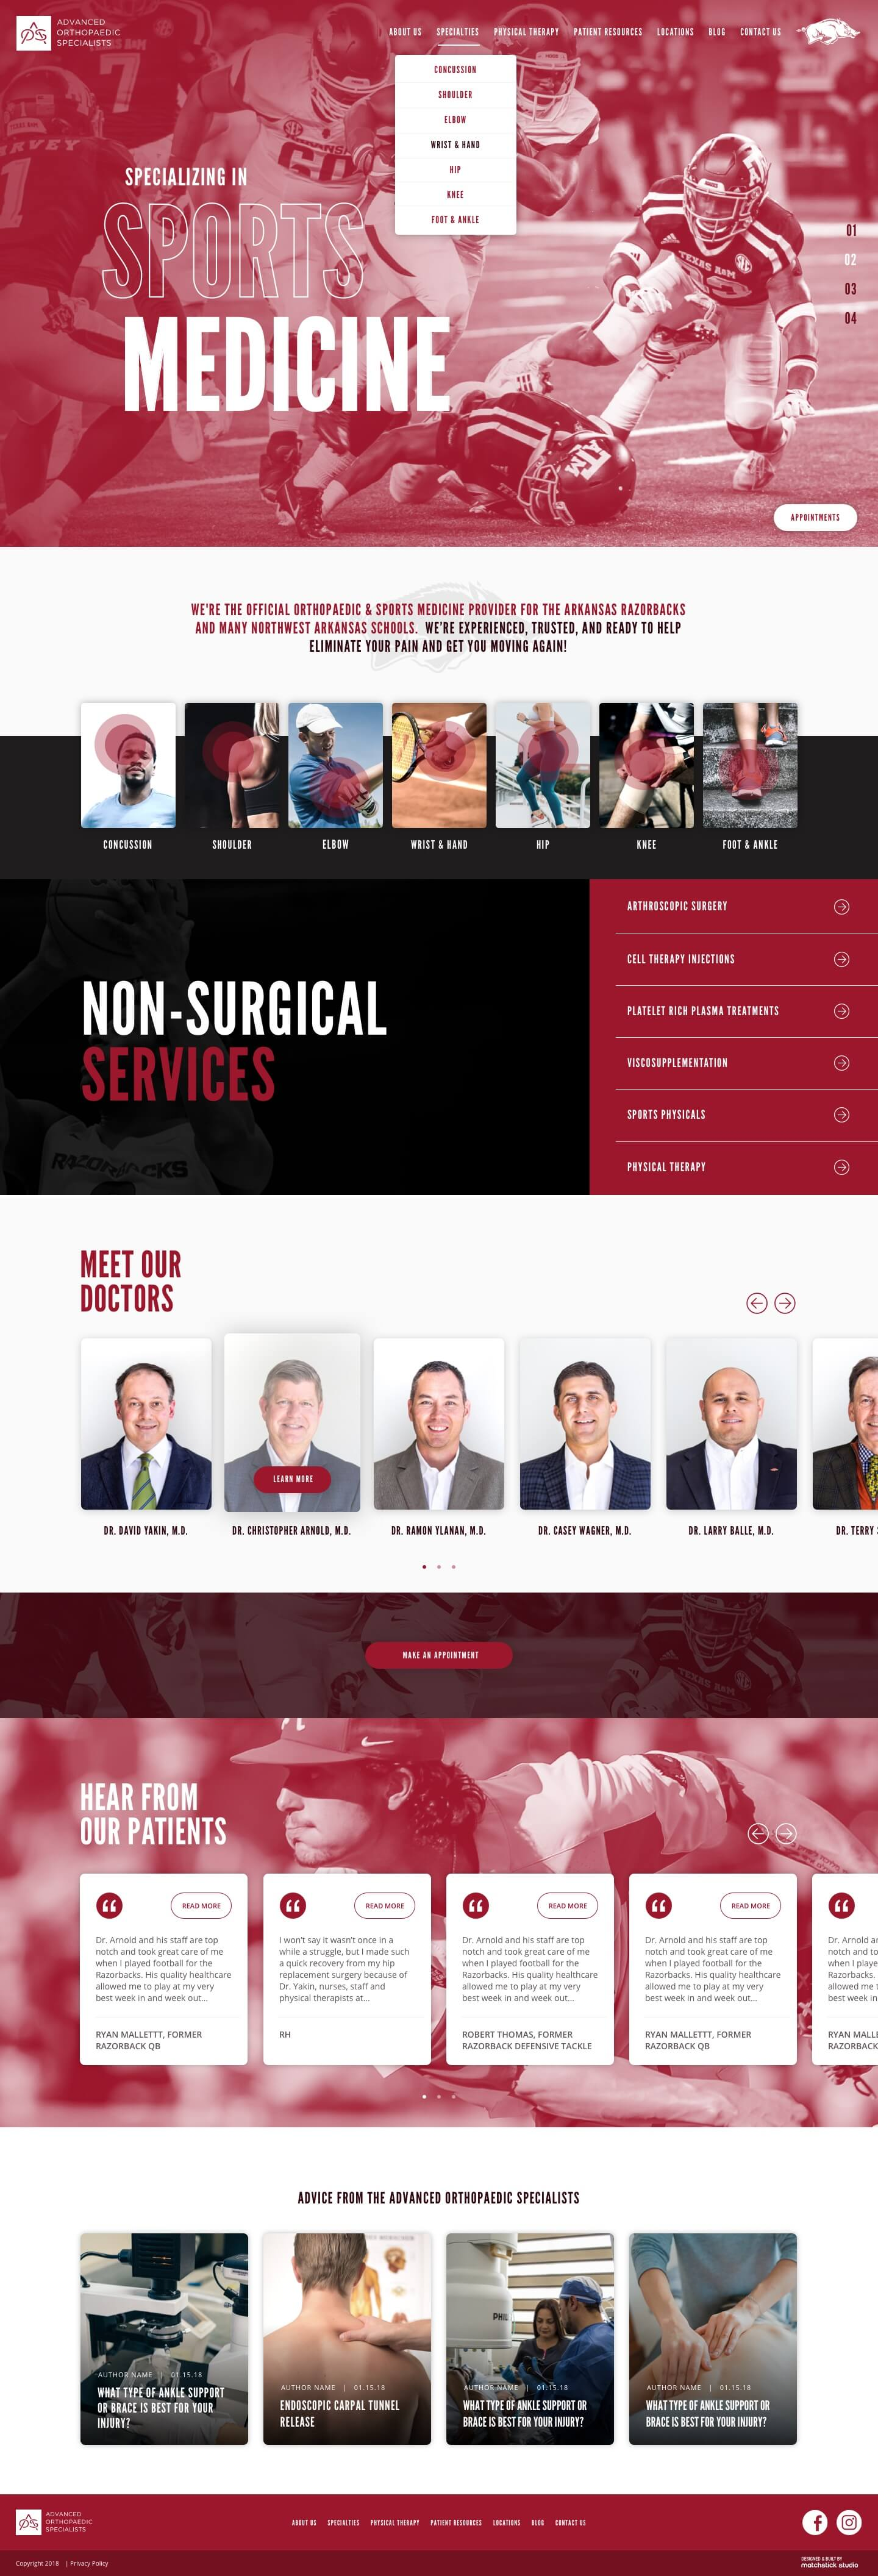 advanced orthopaedic specialists full website homepage